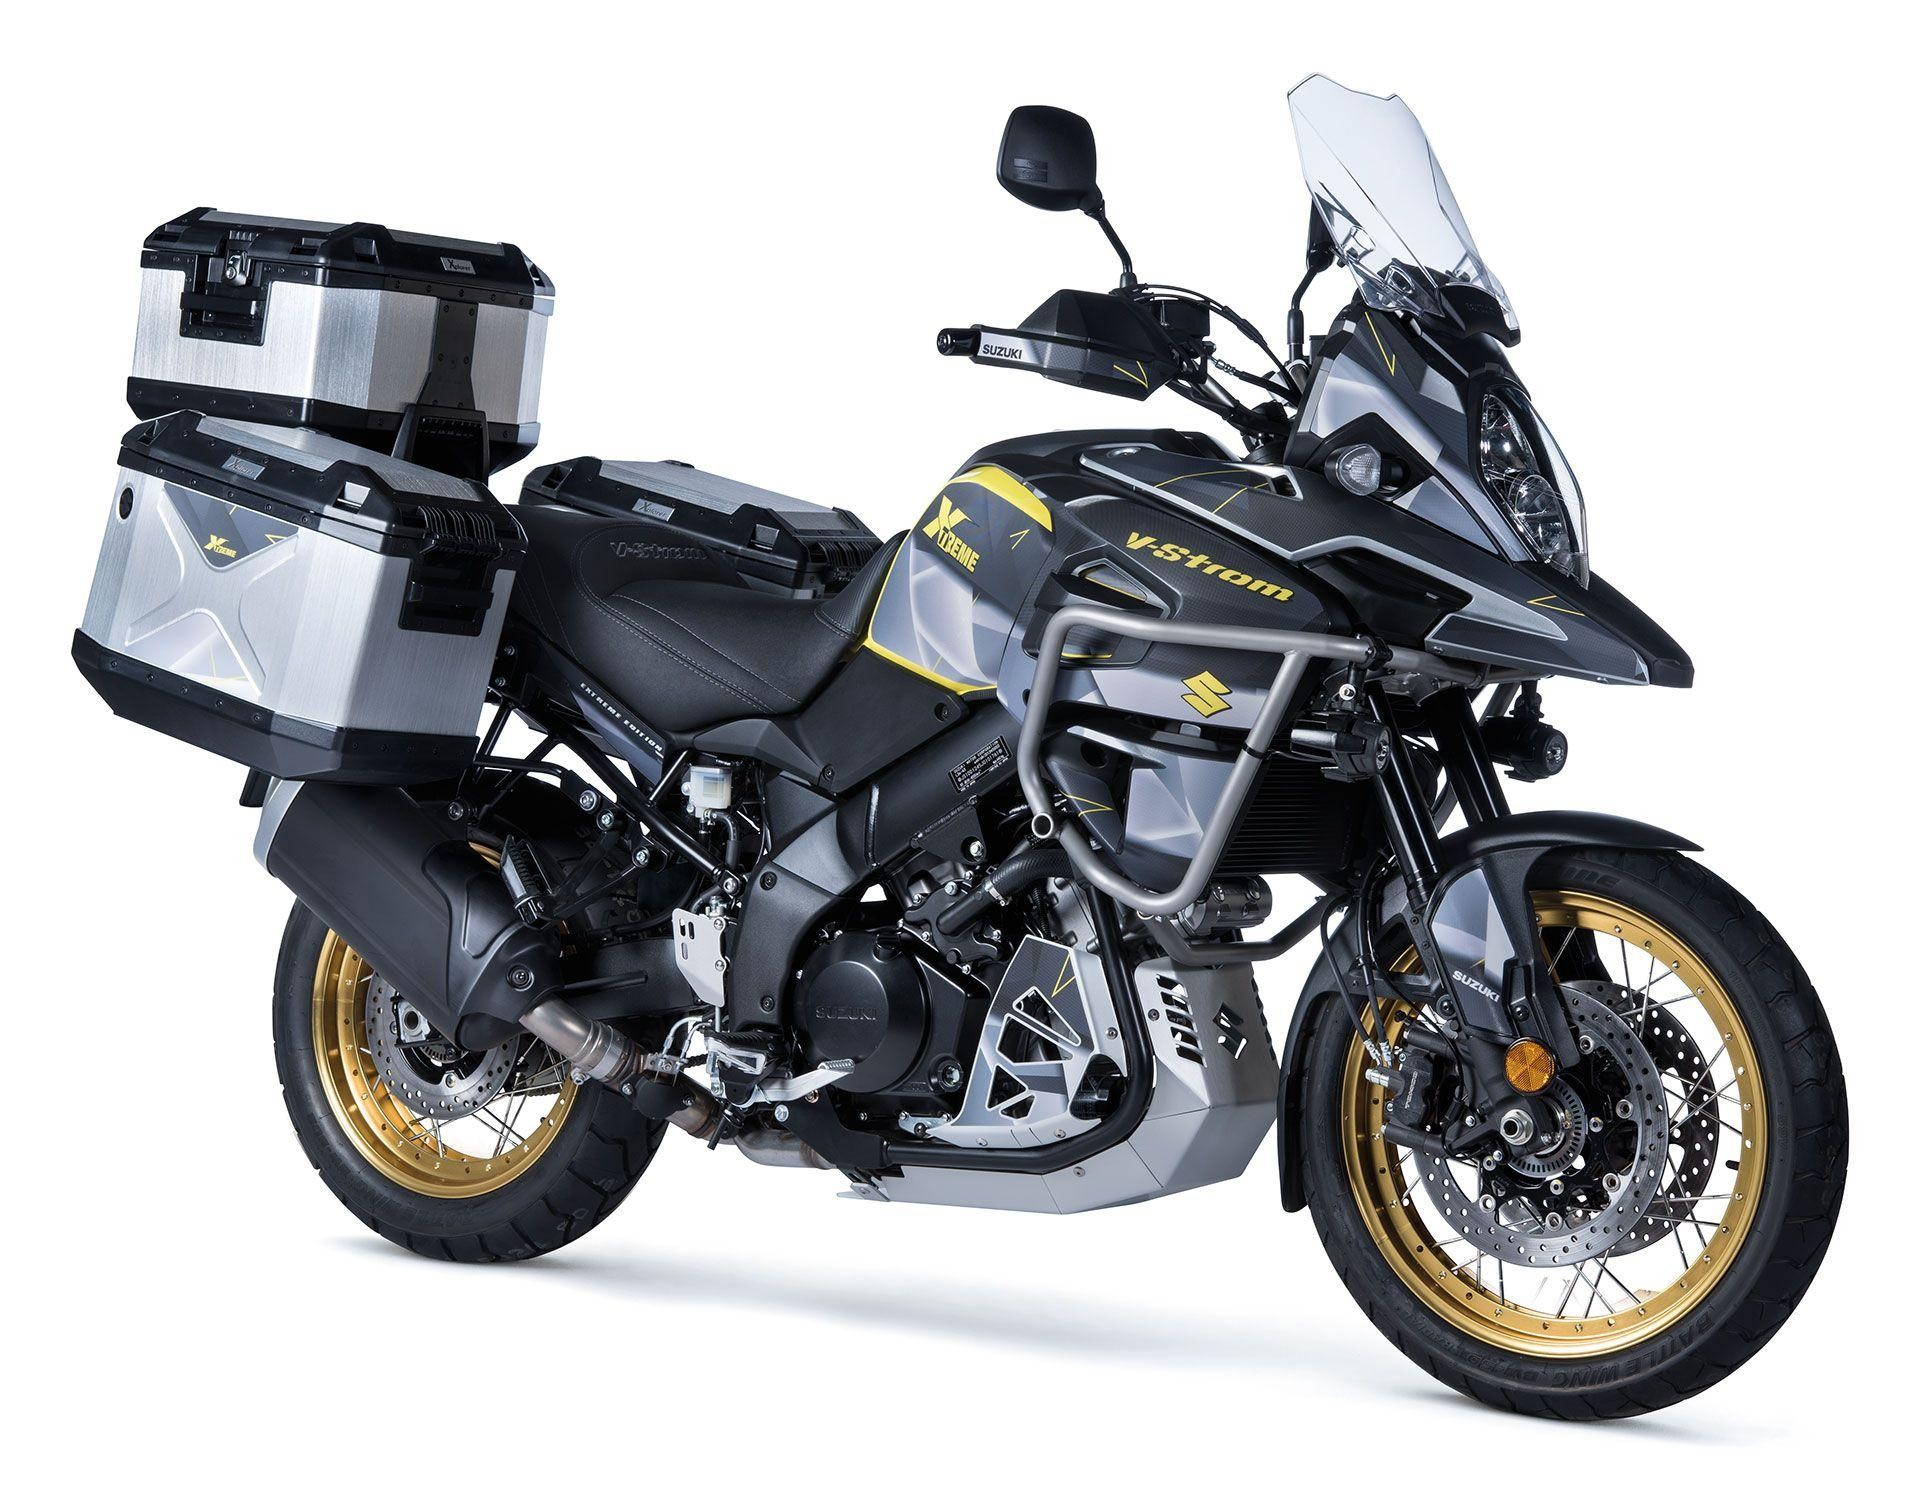 Motorrad Mieten & Roller Mieten SUZUKI DL 1000 A V-Strom ABS